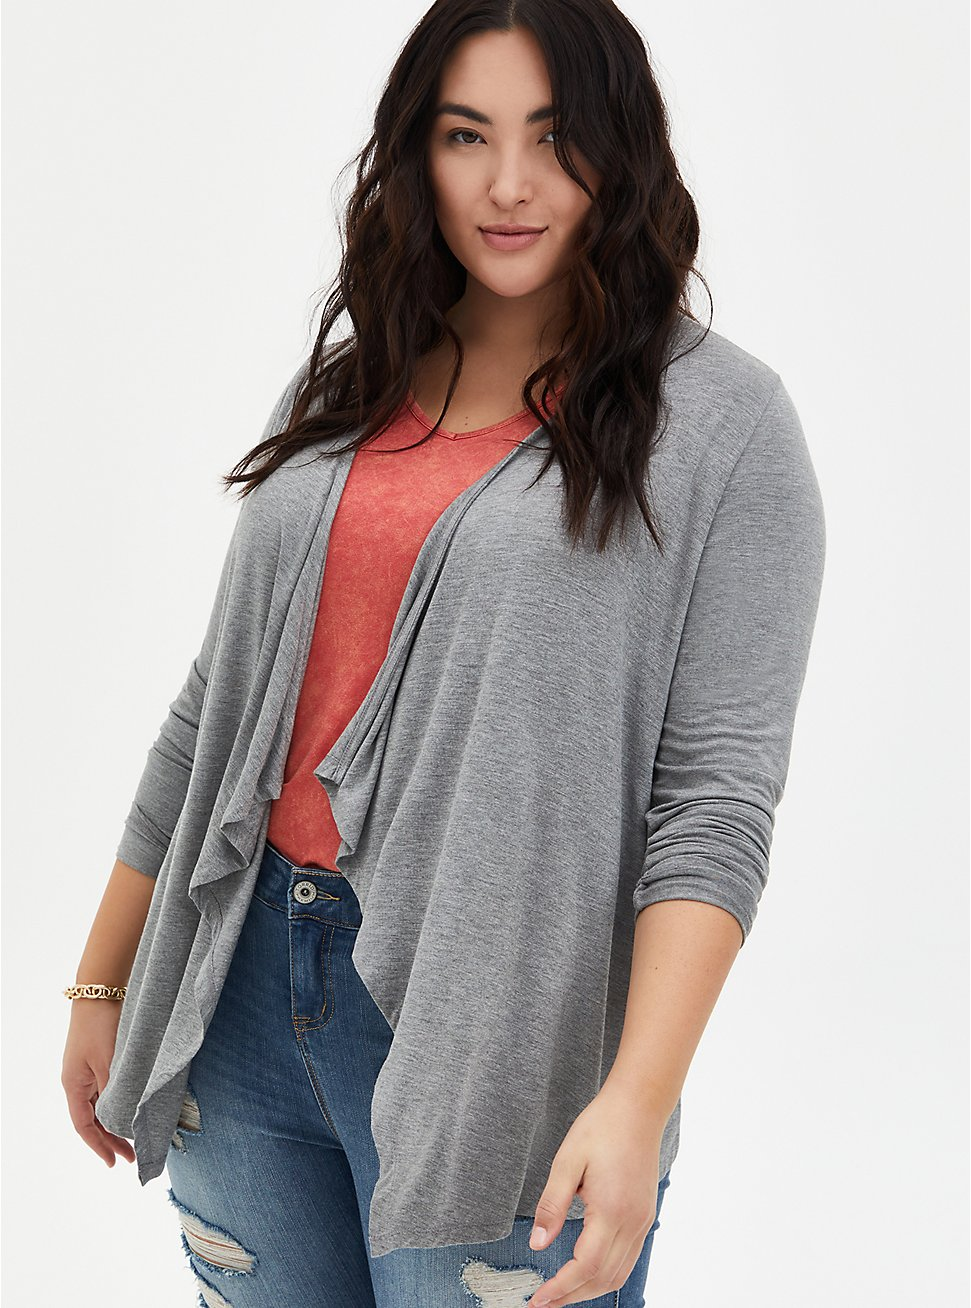 Plus Size Super Soft Heather Grey Drape Front Cardigan, HEATHER GREY, hi-res